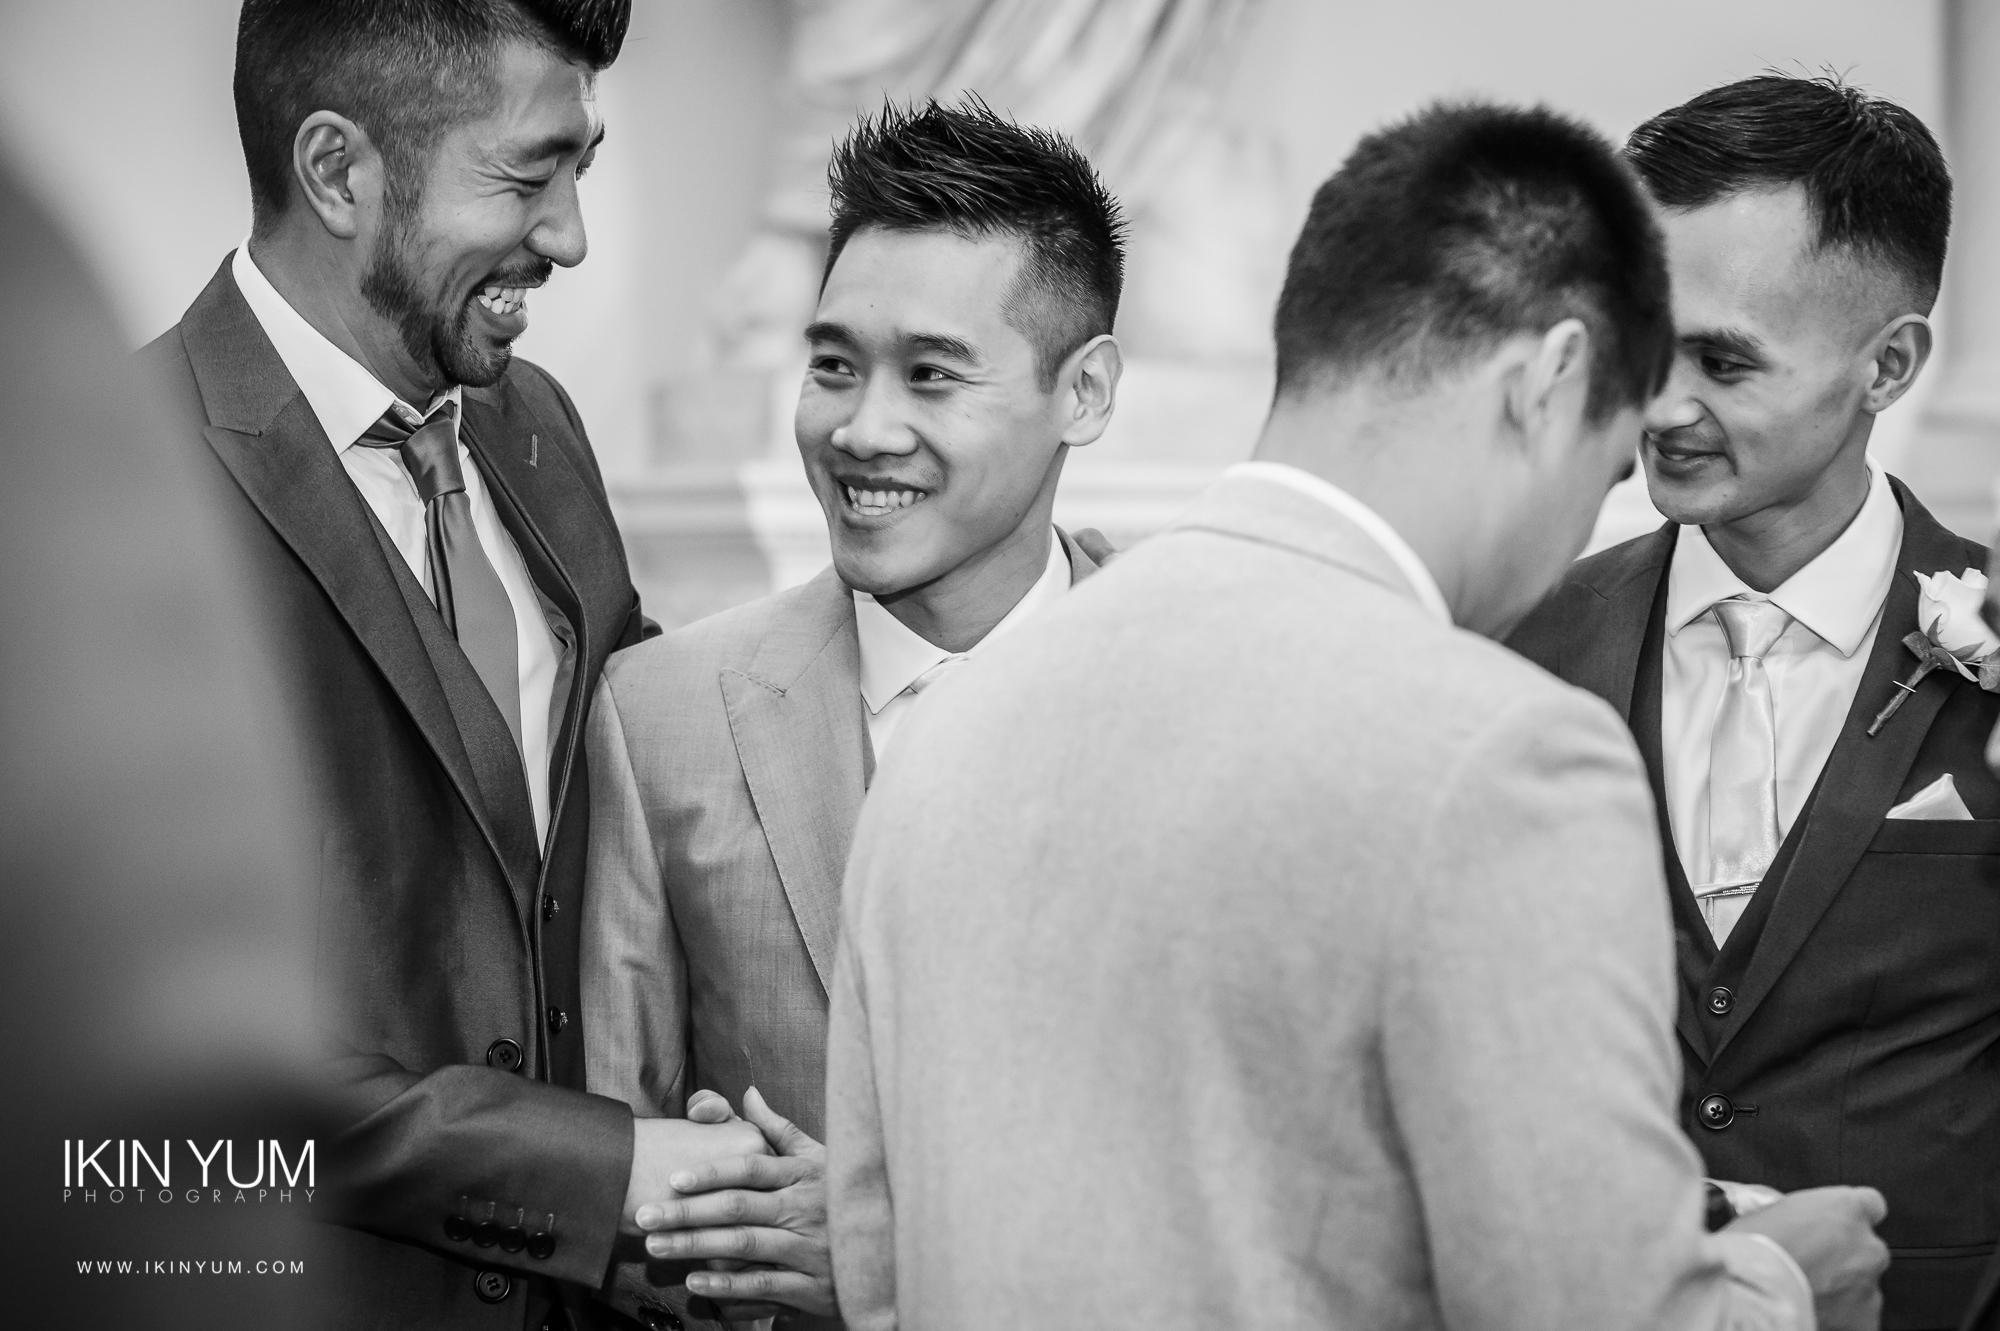 Syon Park Wedding - Ikin Yum Photography -041.jpg